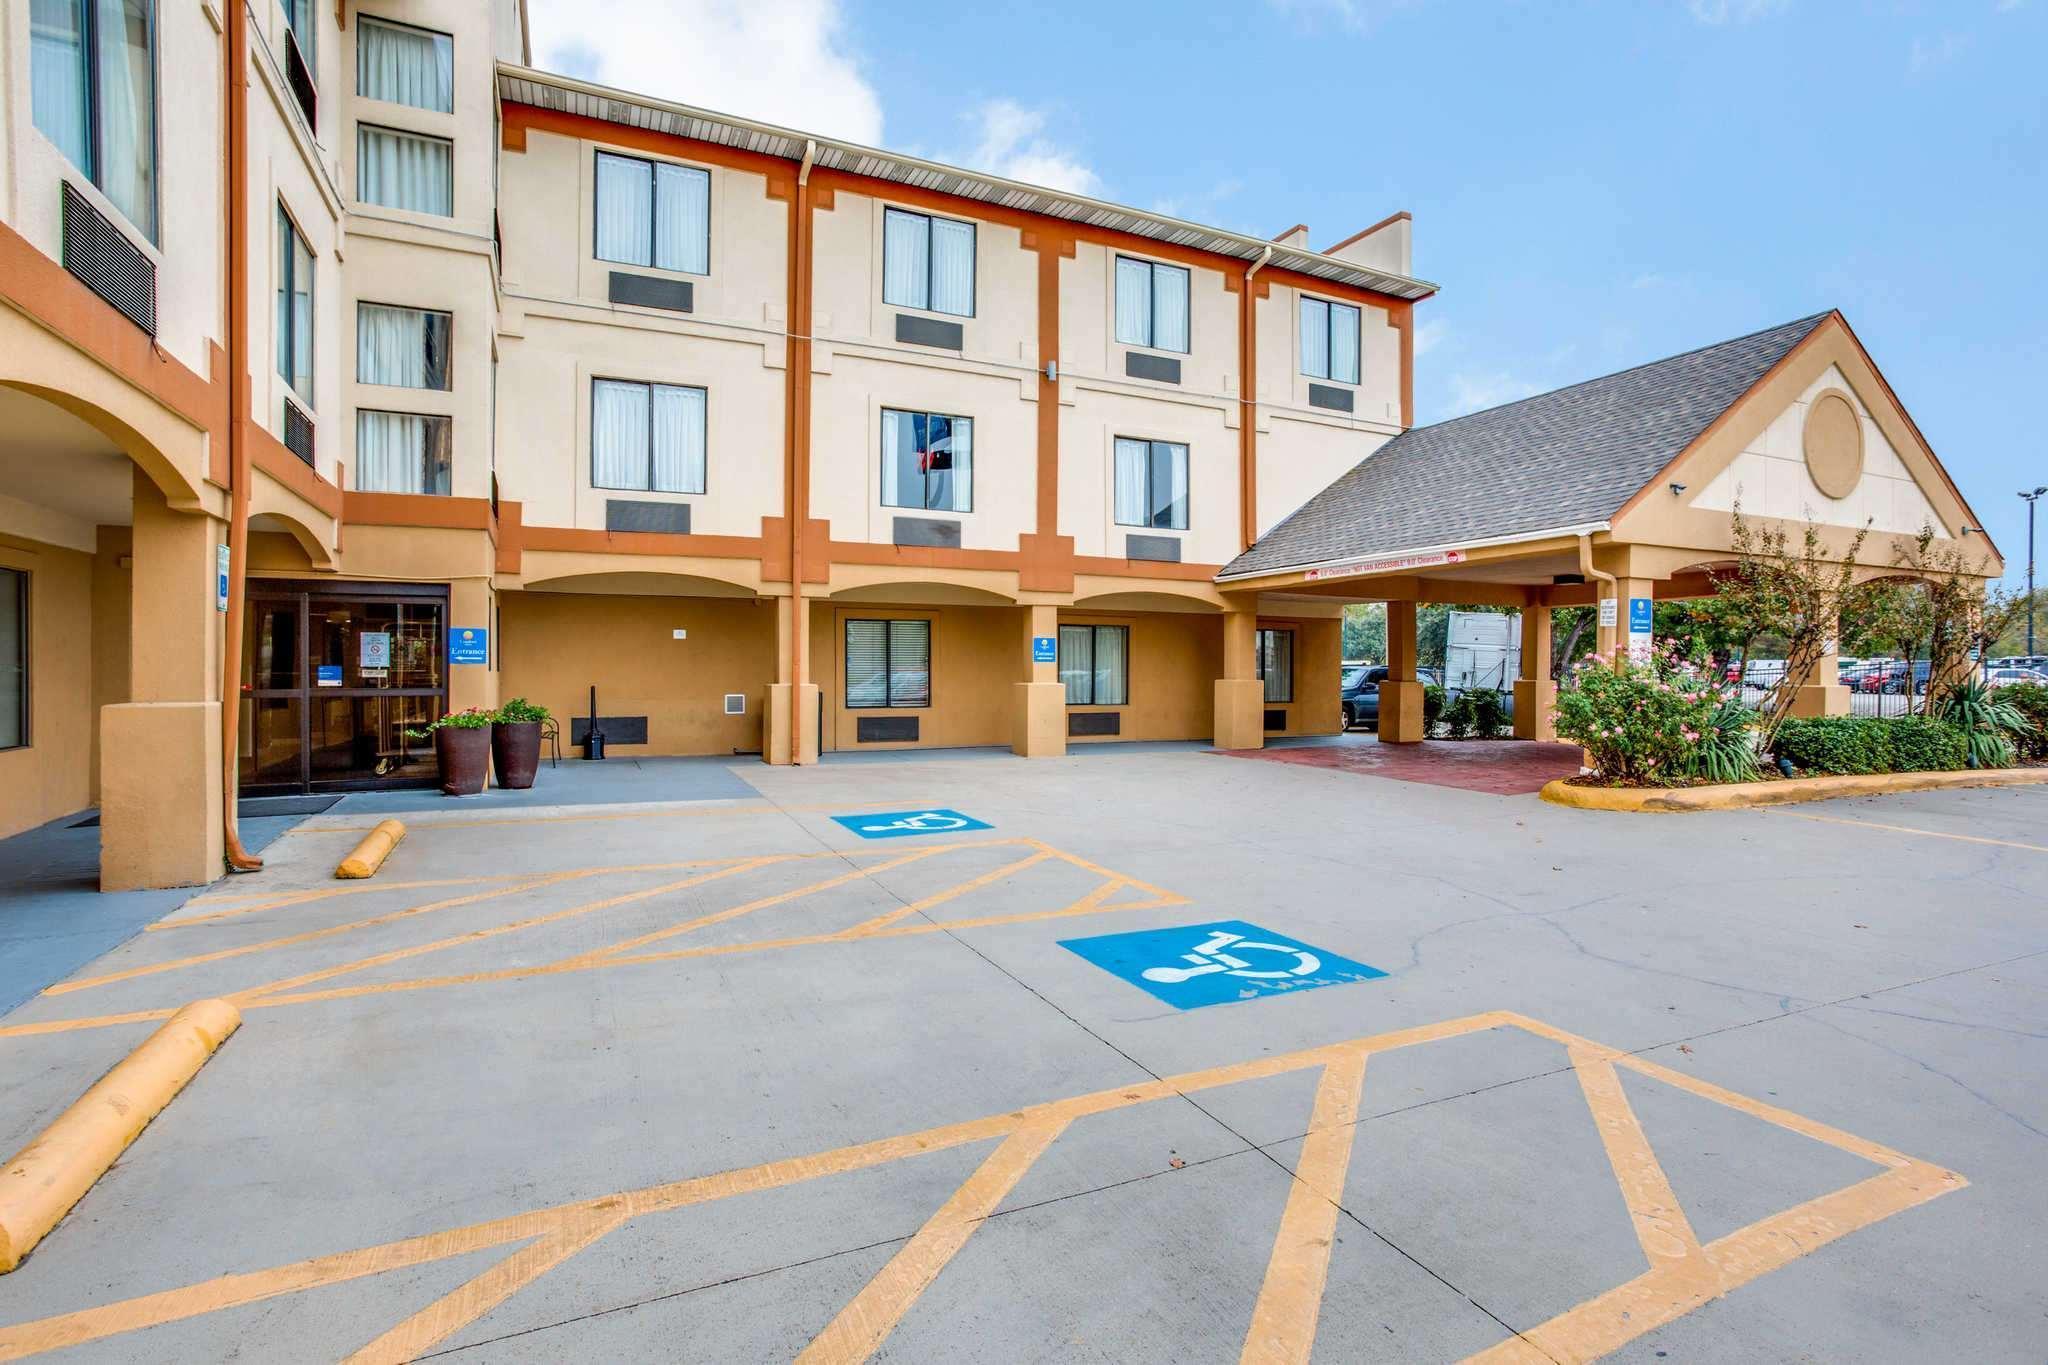 Comfort Inn and Suites Love Field-Dallas Market Center